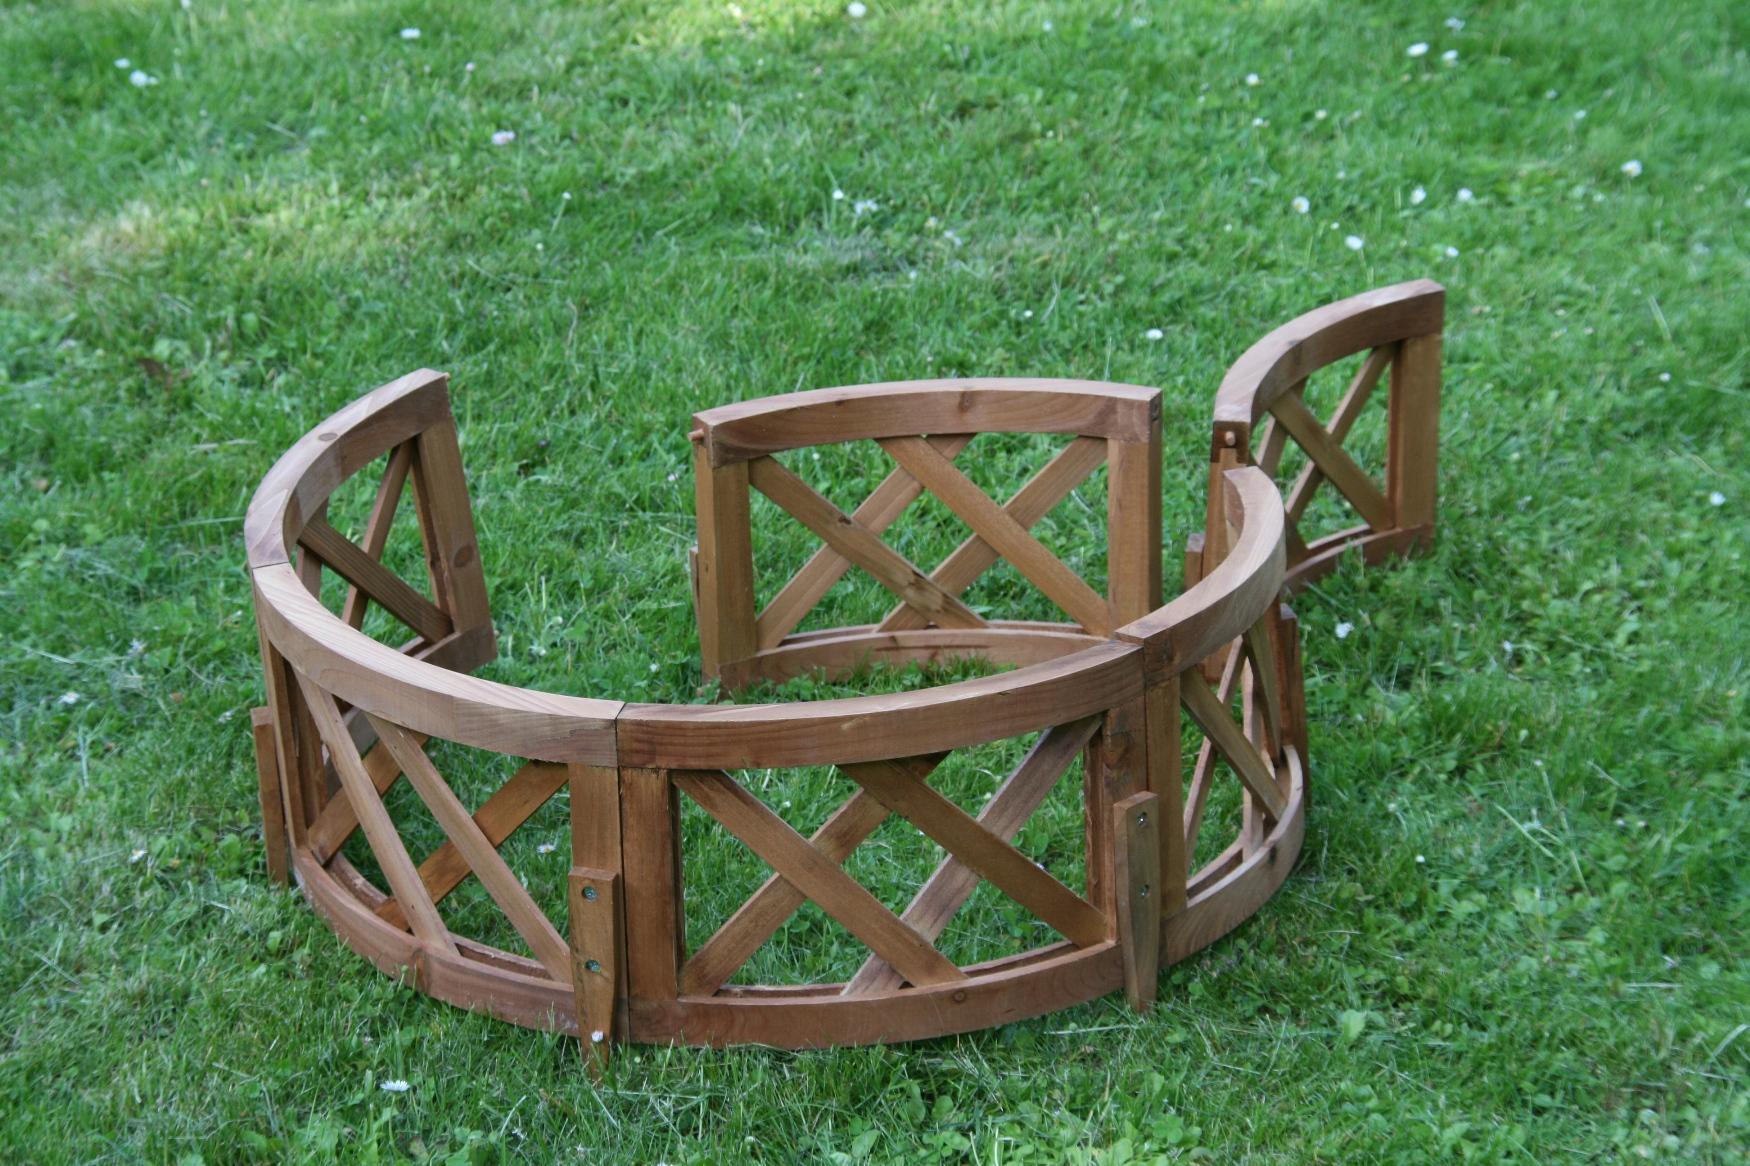 6 tlg gartenzaun natur pflanzenbegrenzung beetzaun. Black Bedroom Furniture Sets. Home Design Ideas